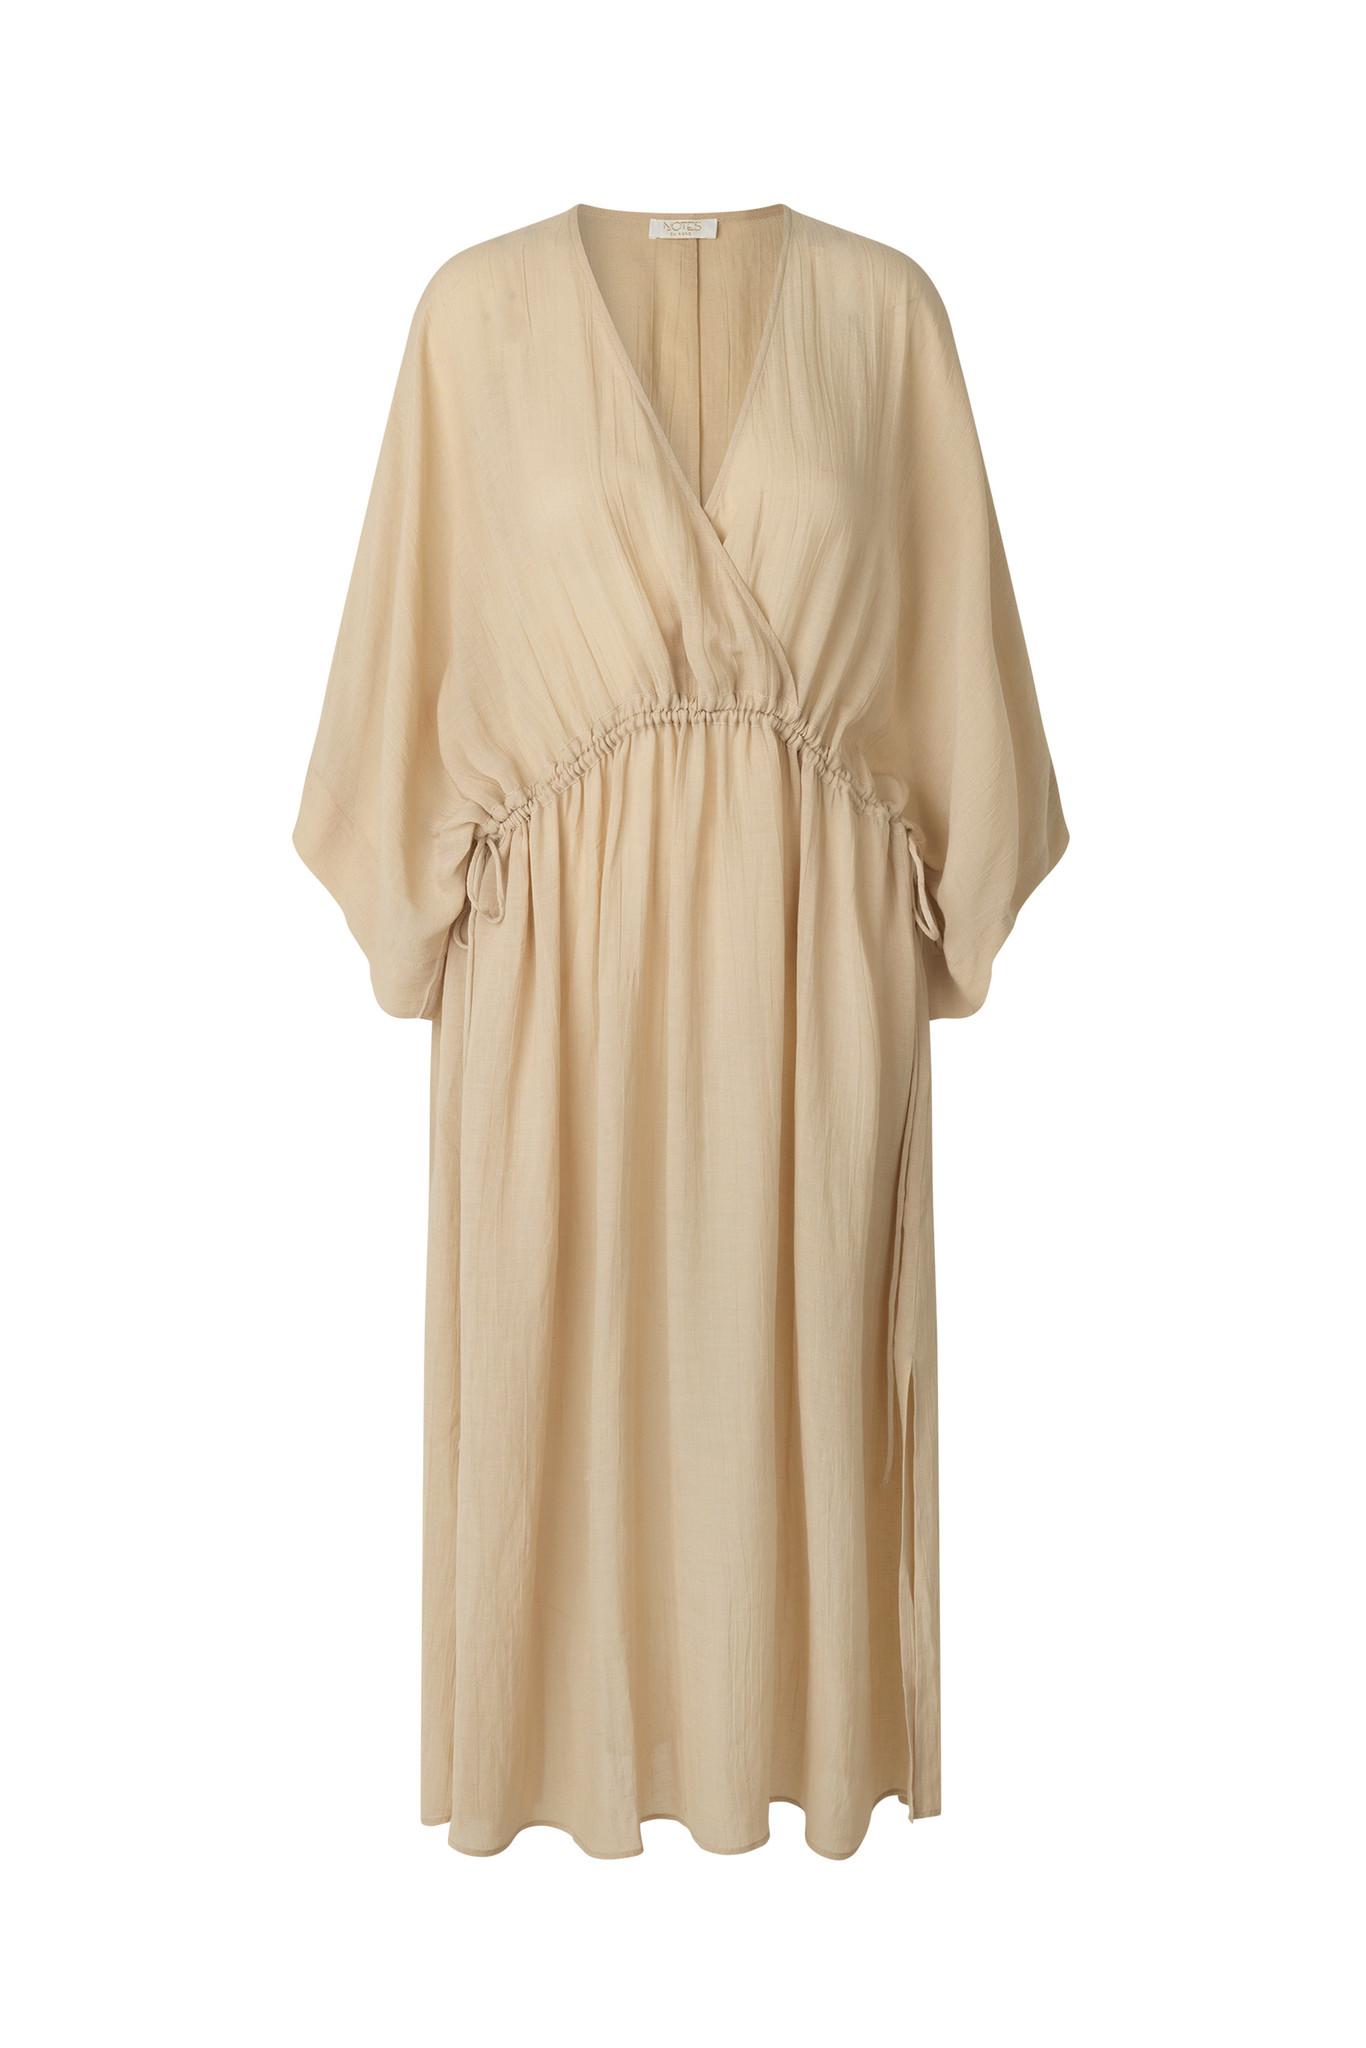 Tamia Dress - Beige-1